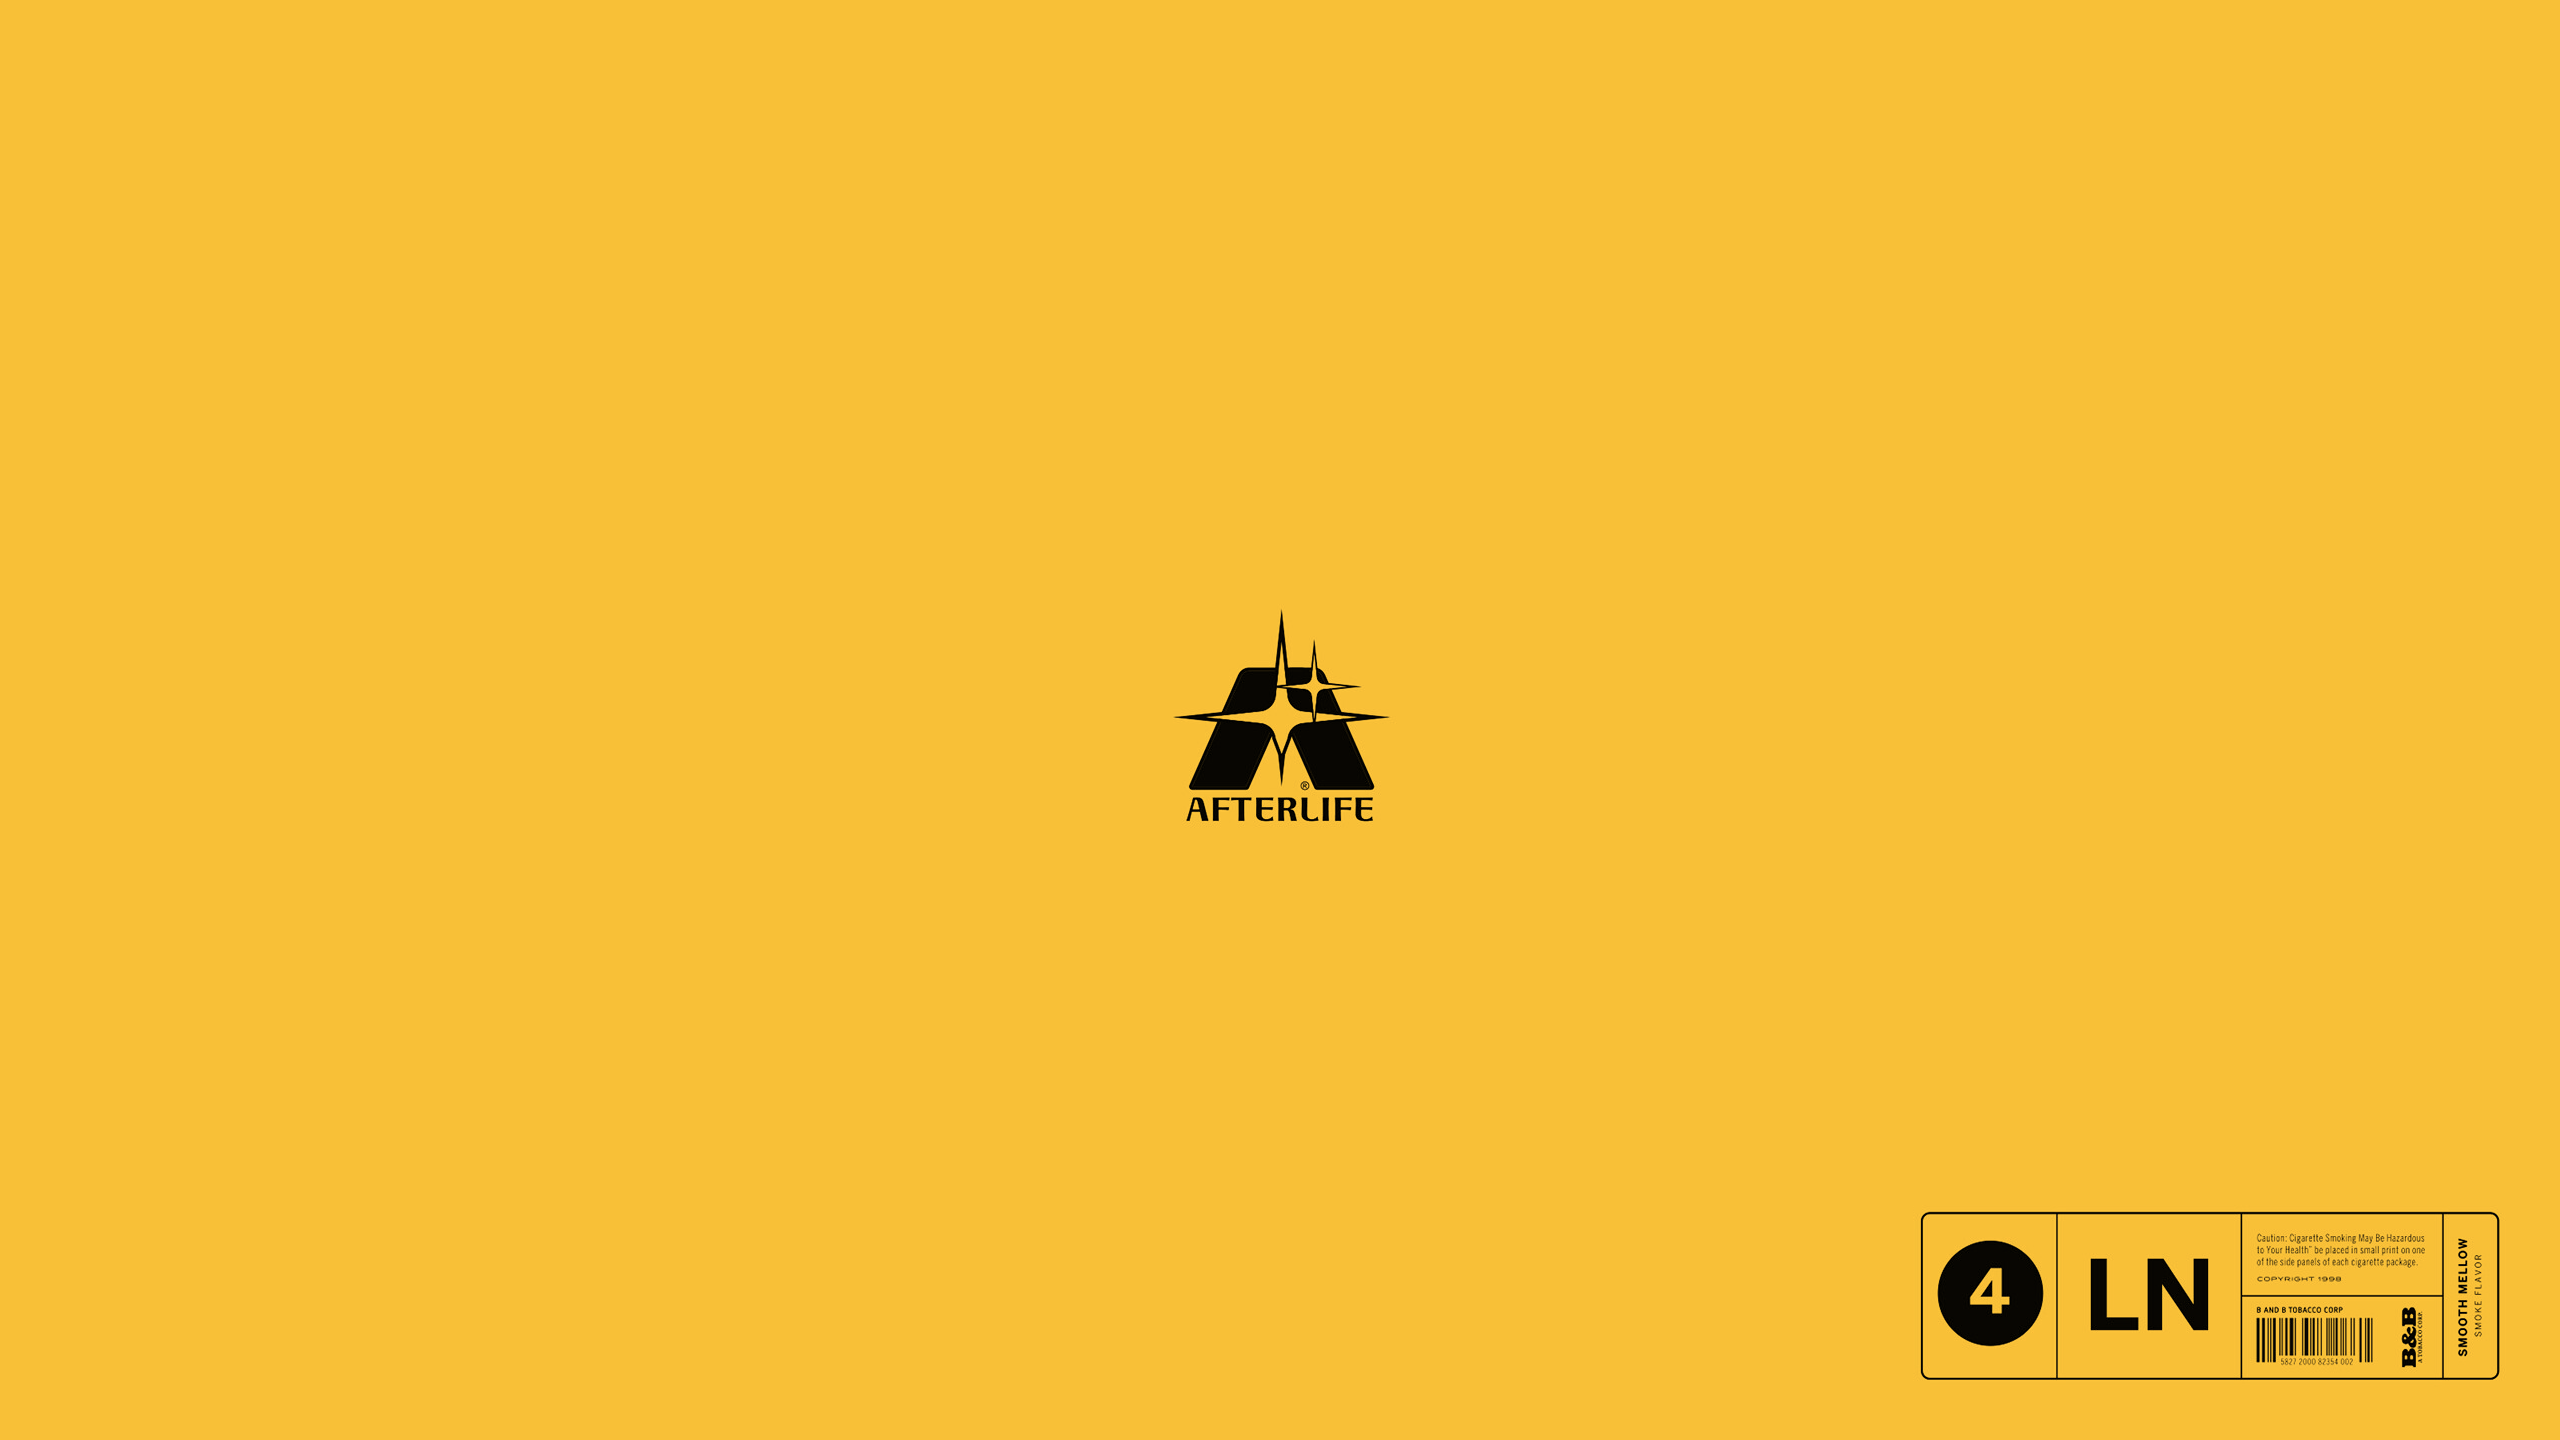 Bao T Nguyen Graphic Design Minimalism Logotype Logo Typography Material Minimal Simple Background 2560x1440